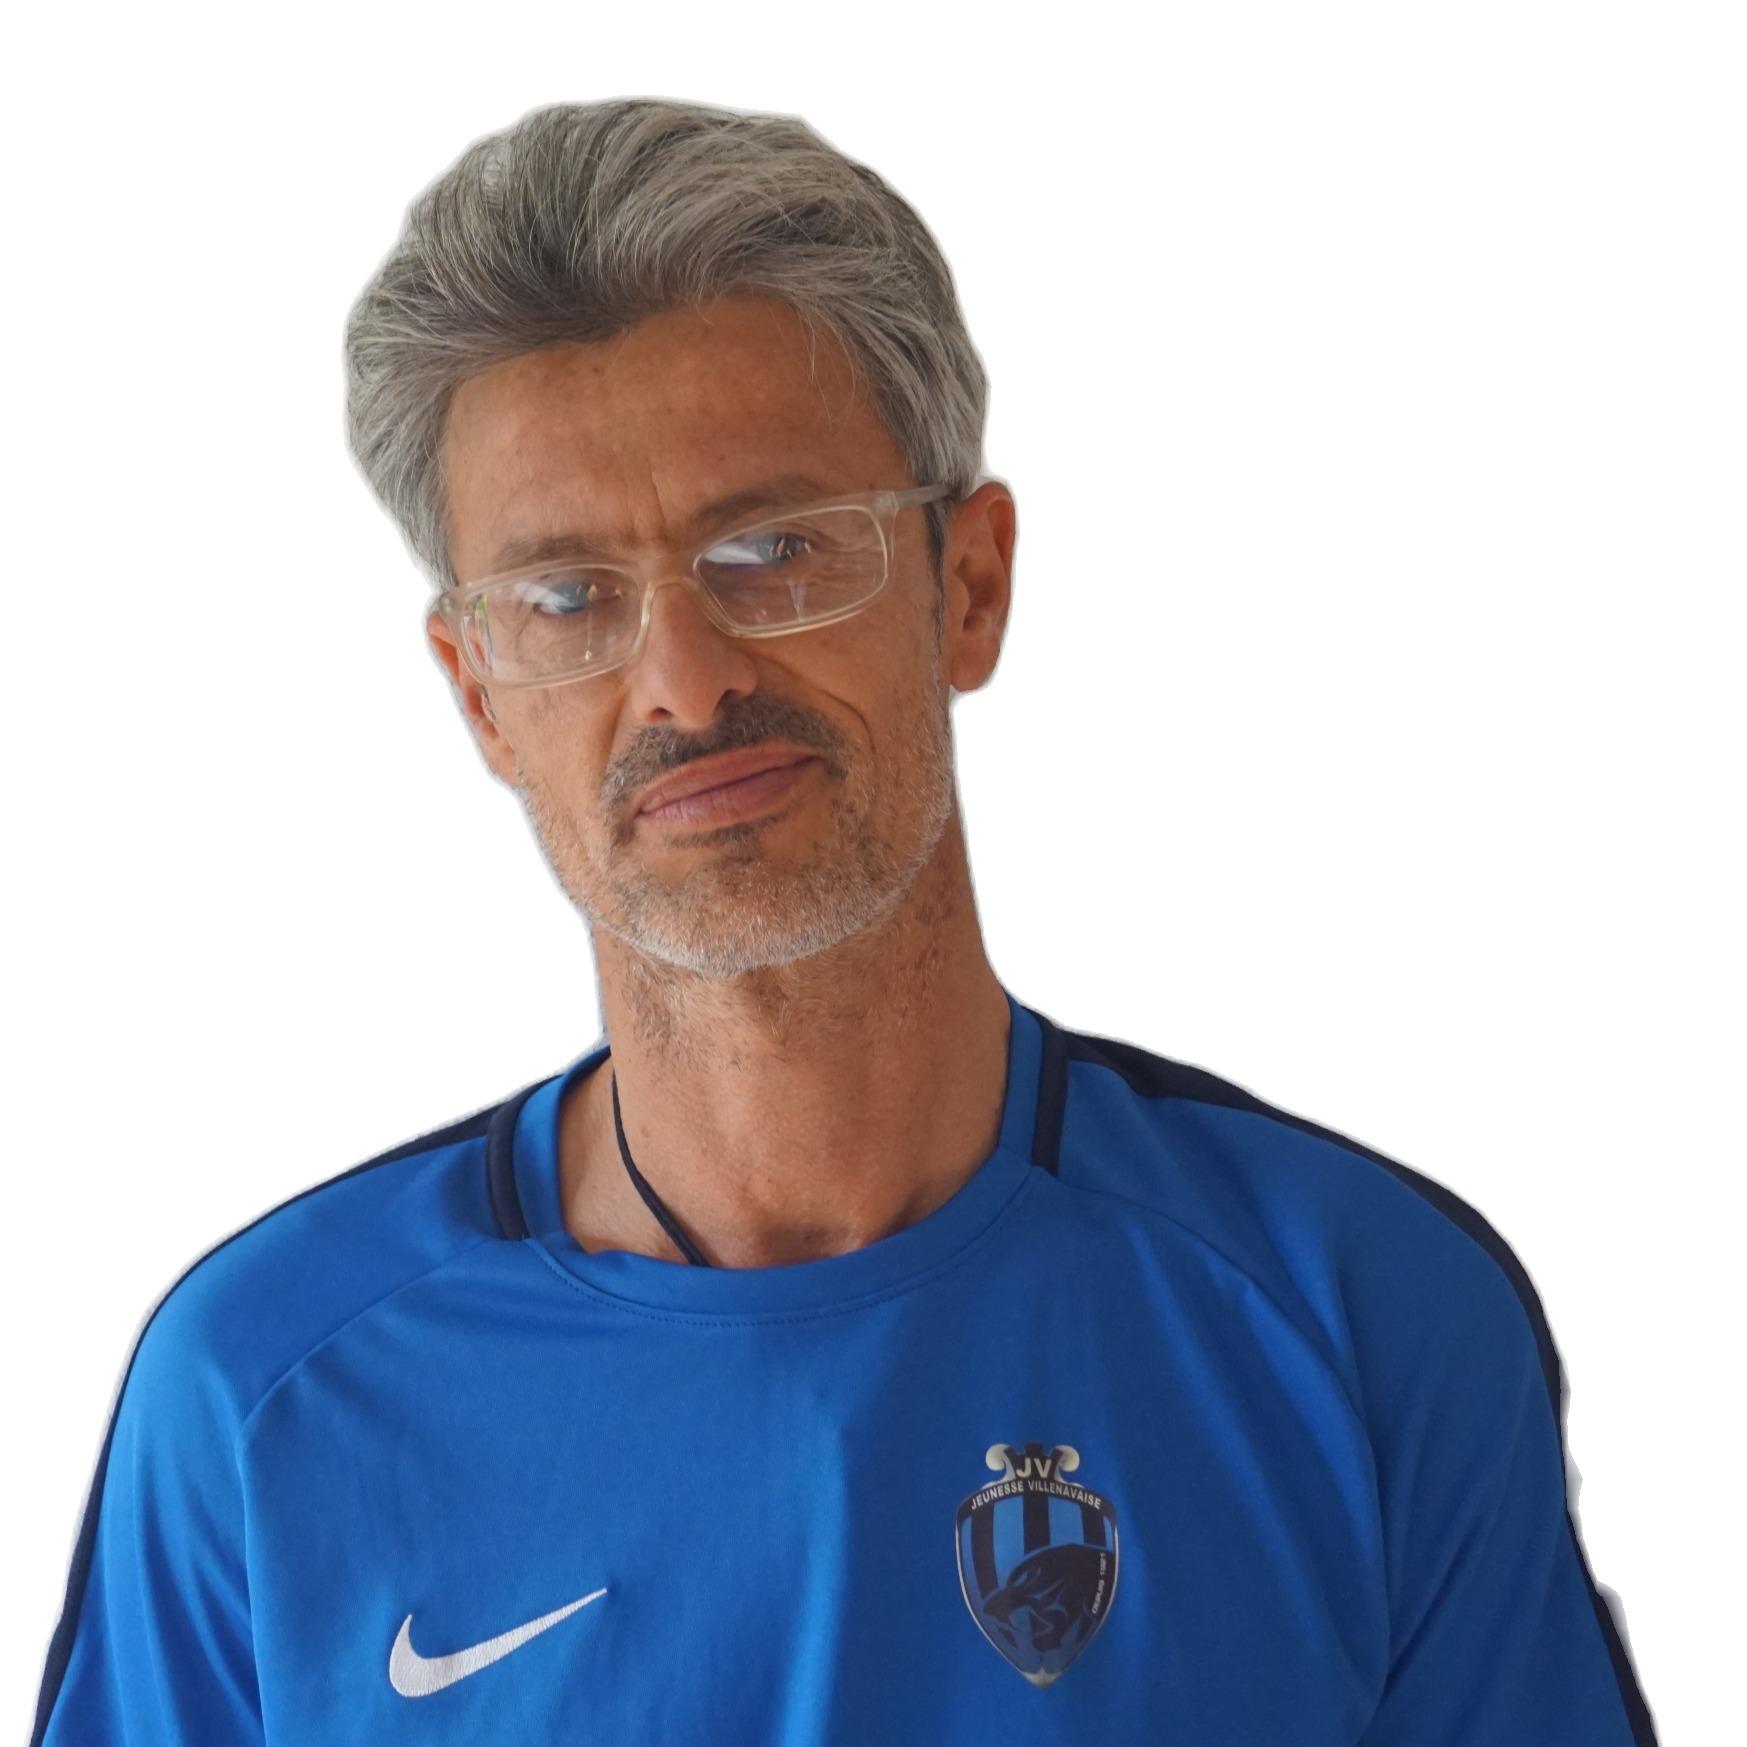 Pierre Cassagne